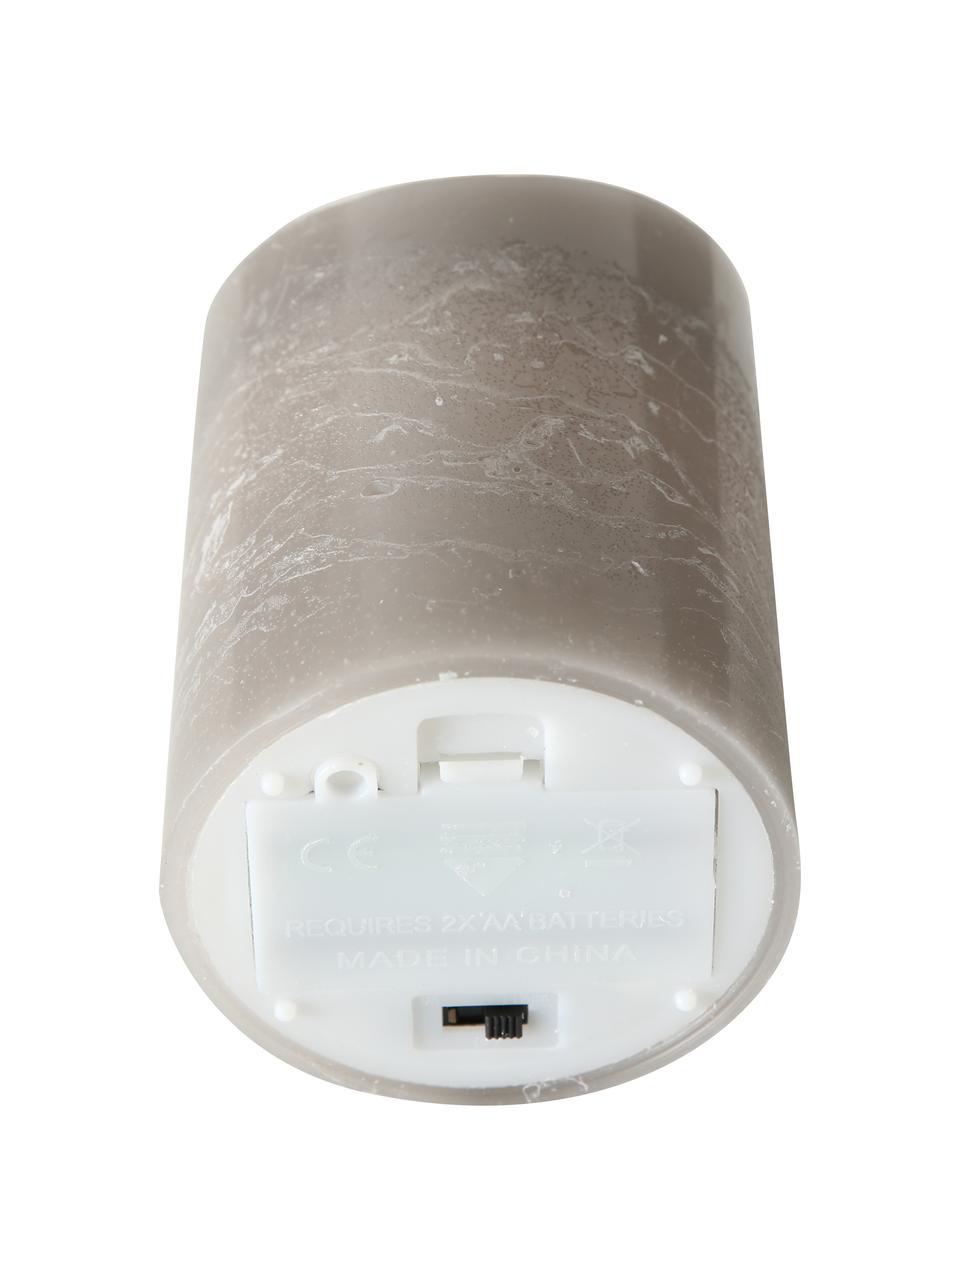 LED-Kerze Bino, Grau, Ø 8 x H 12 cm